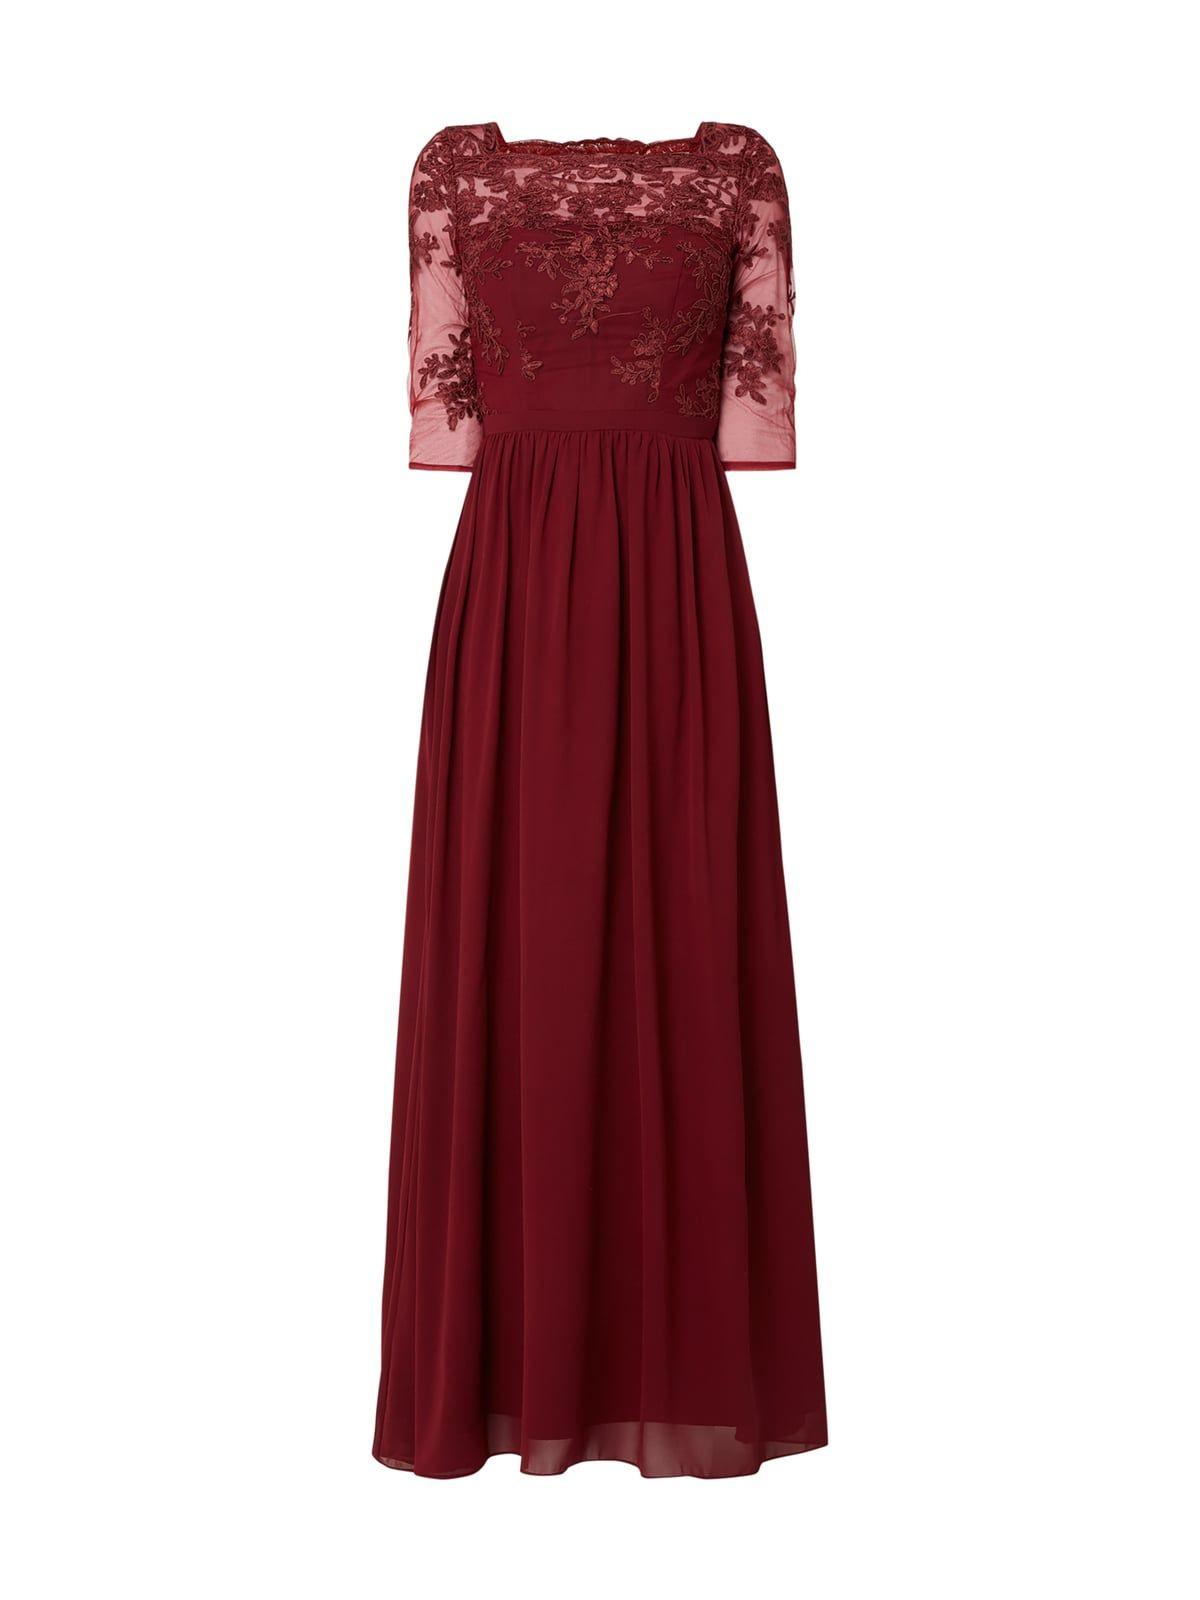 17 Kreativ P&C Abendkleider Lang Sale Bester PreisAbend Großartig P&C Abendkleider Lang Sale für 2019